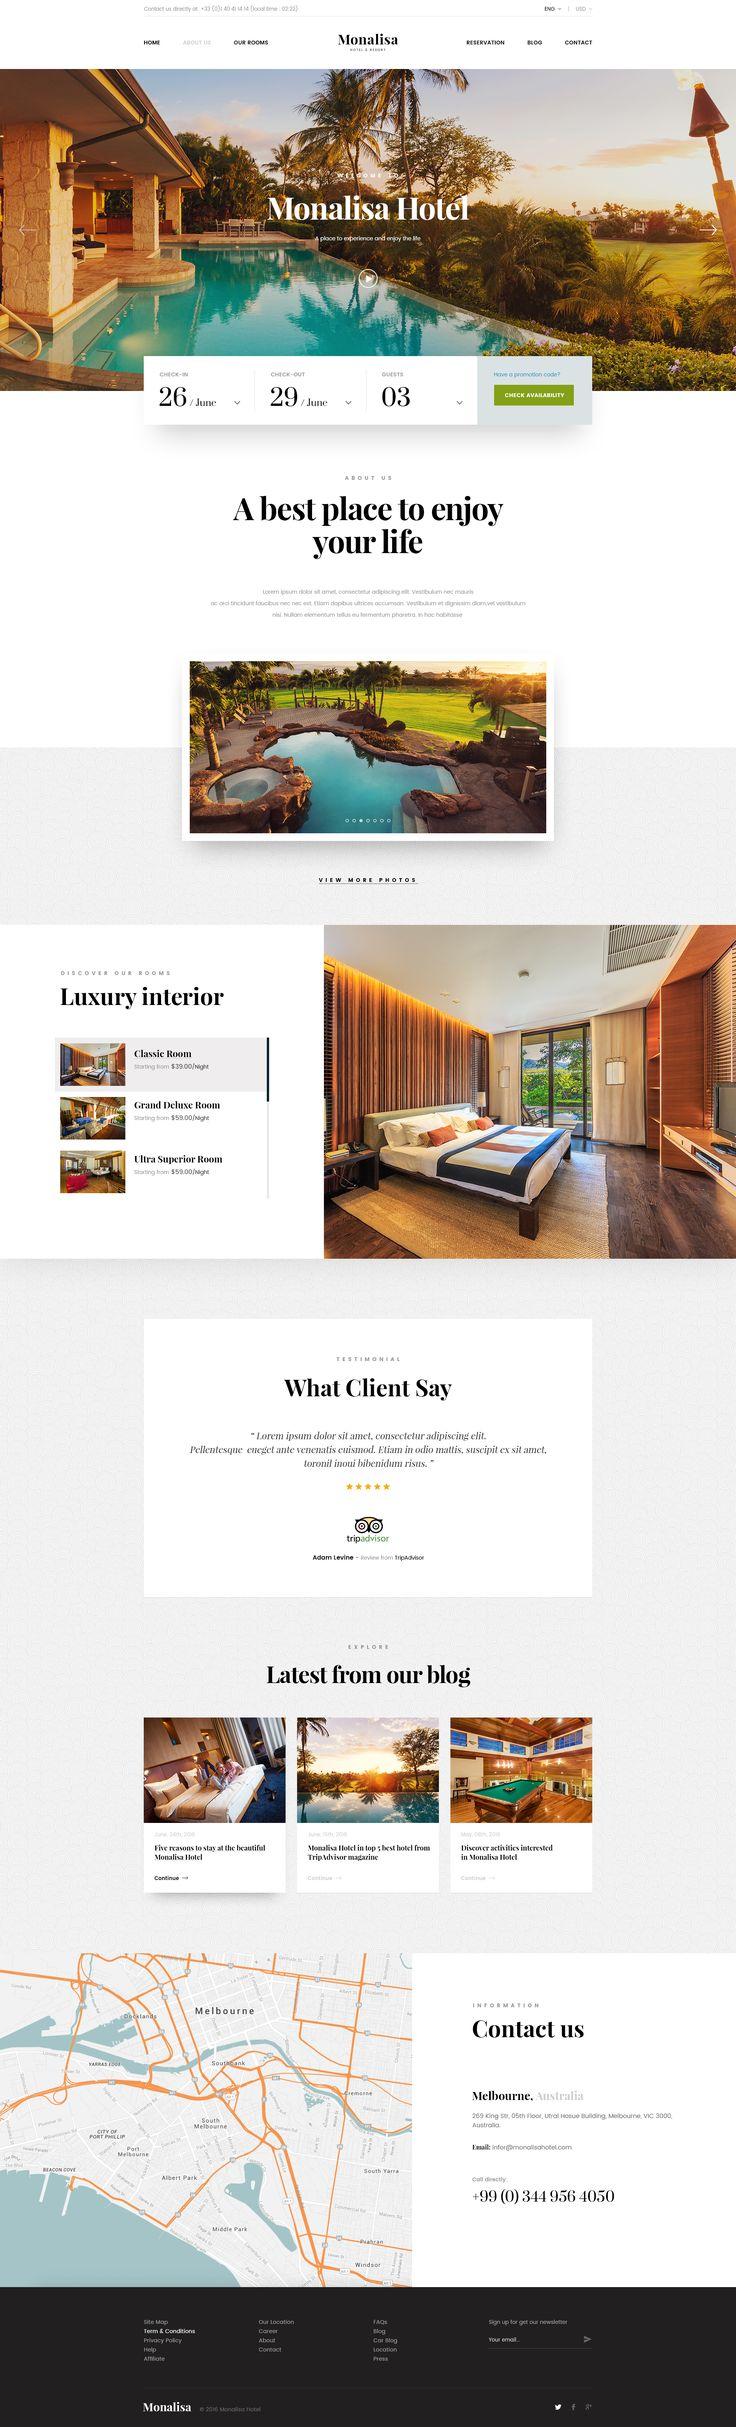 Dribbble - home.jpg by C-Knightz Art  호텔의 예약이나 언제나 찾을 수 있는 특수성 때문에 날짜가 사용자에게 가장 중요한 요구 사항이다. 따라서 날짜를 중심으로 예약할 수 있는 홈페이지 시스템을 선보이고 있다. 사용자의 요구가 잘 반영된 홈페이지라고 생각된다.